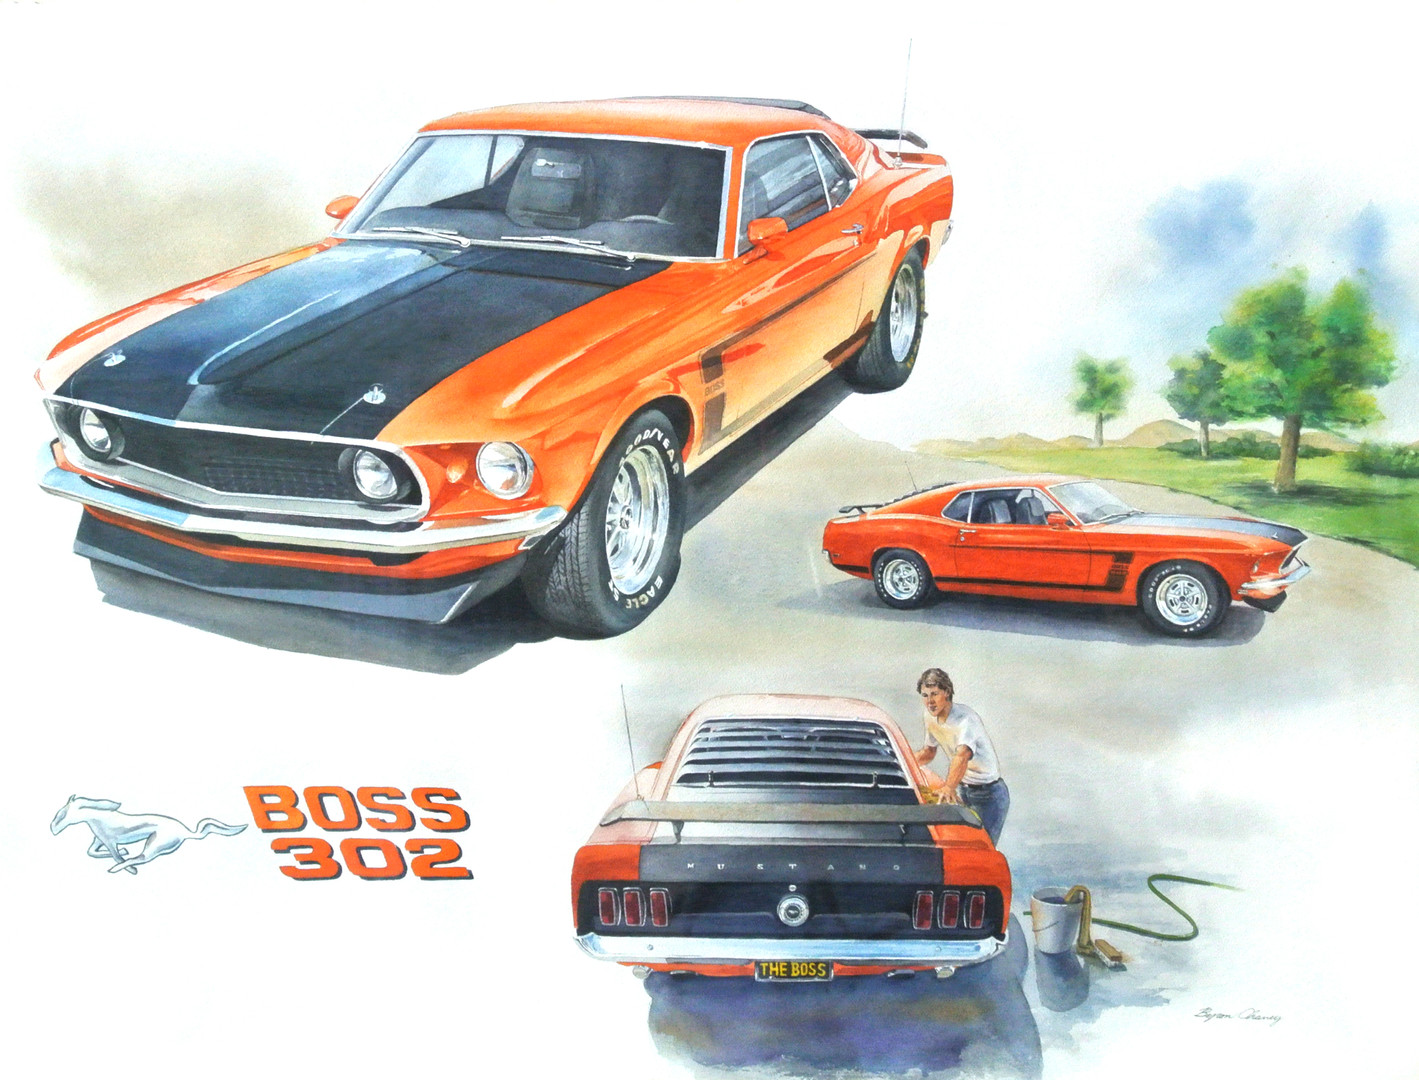 Boss 302 Mustang.jpg